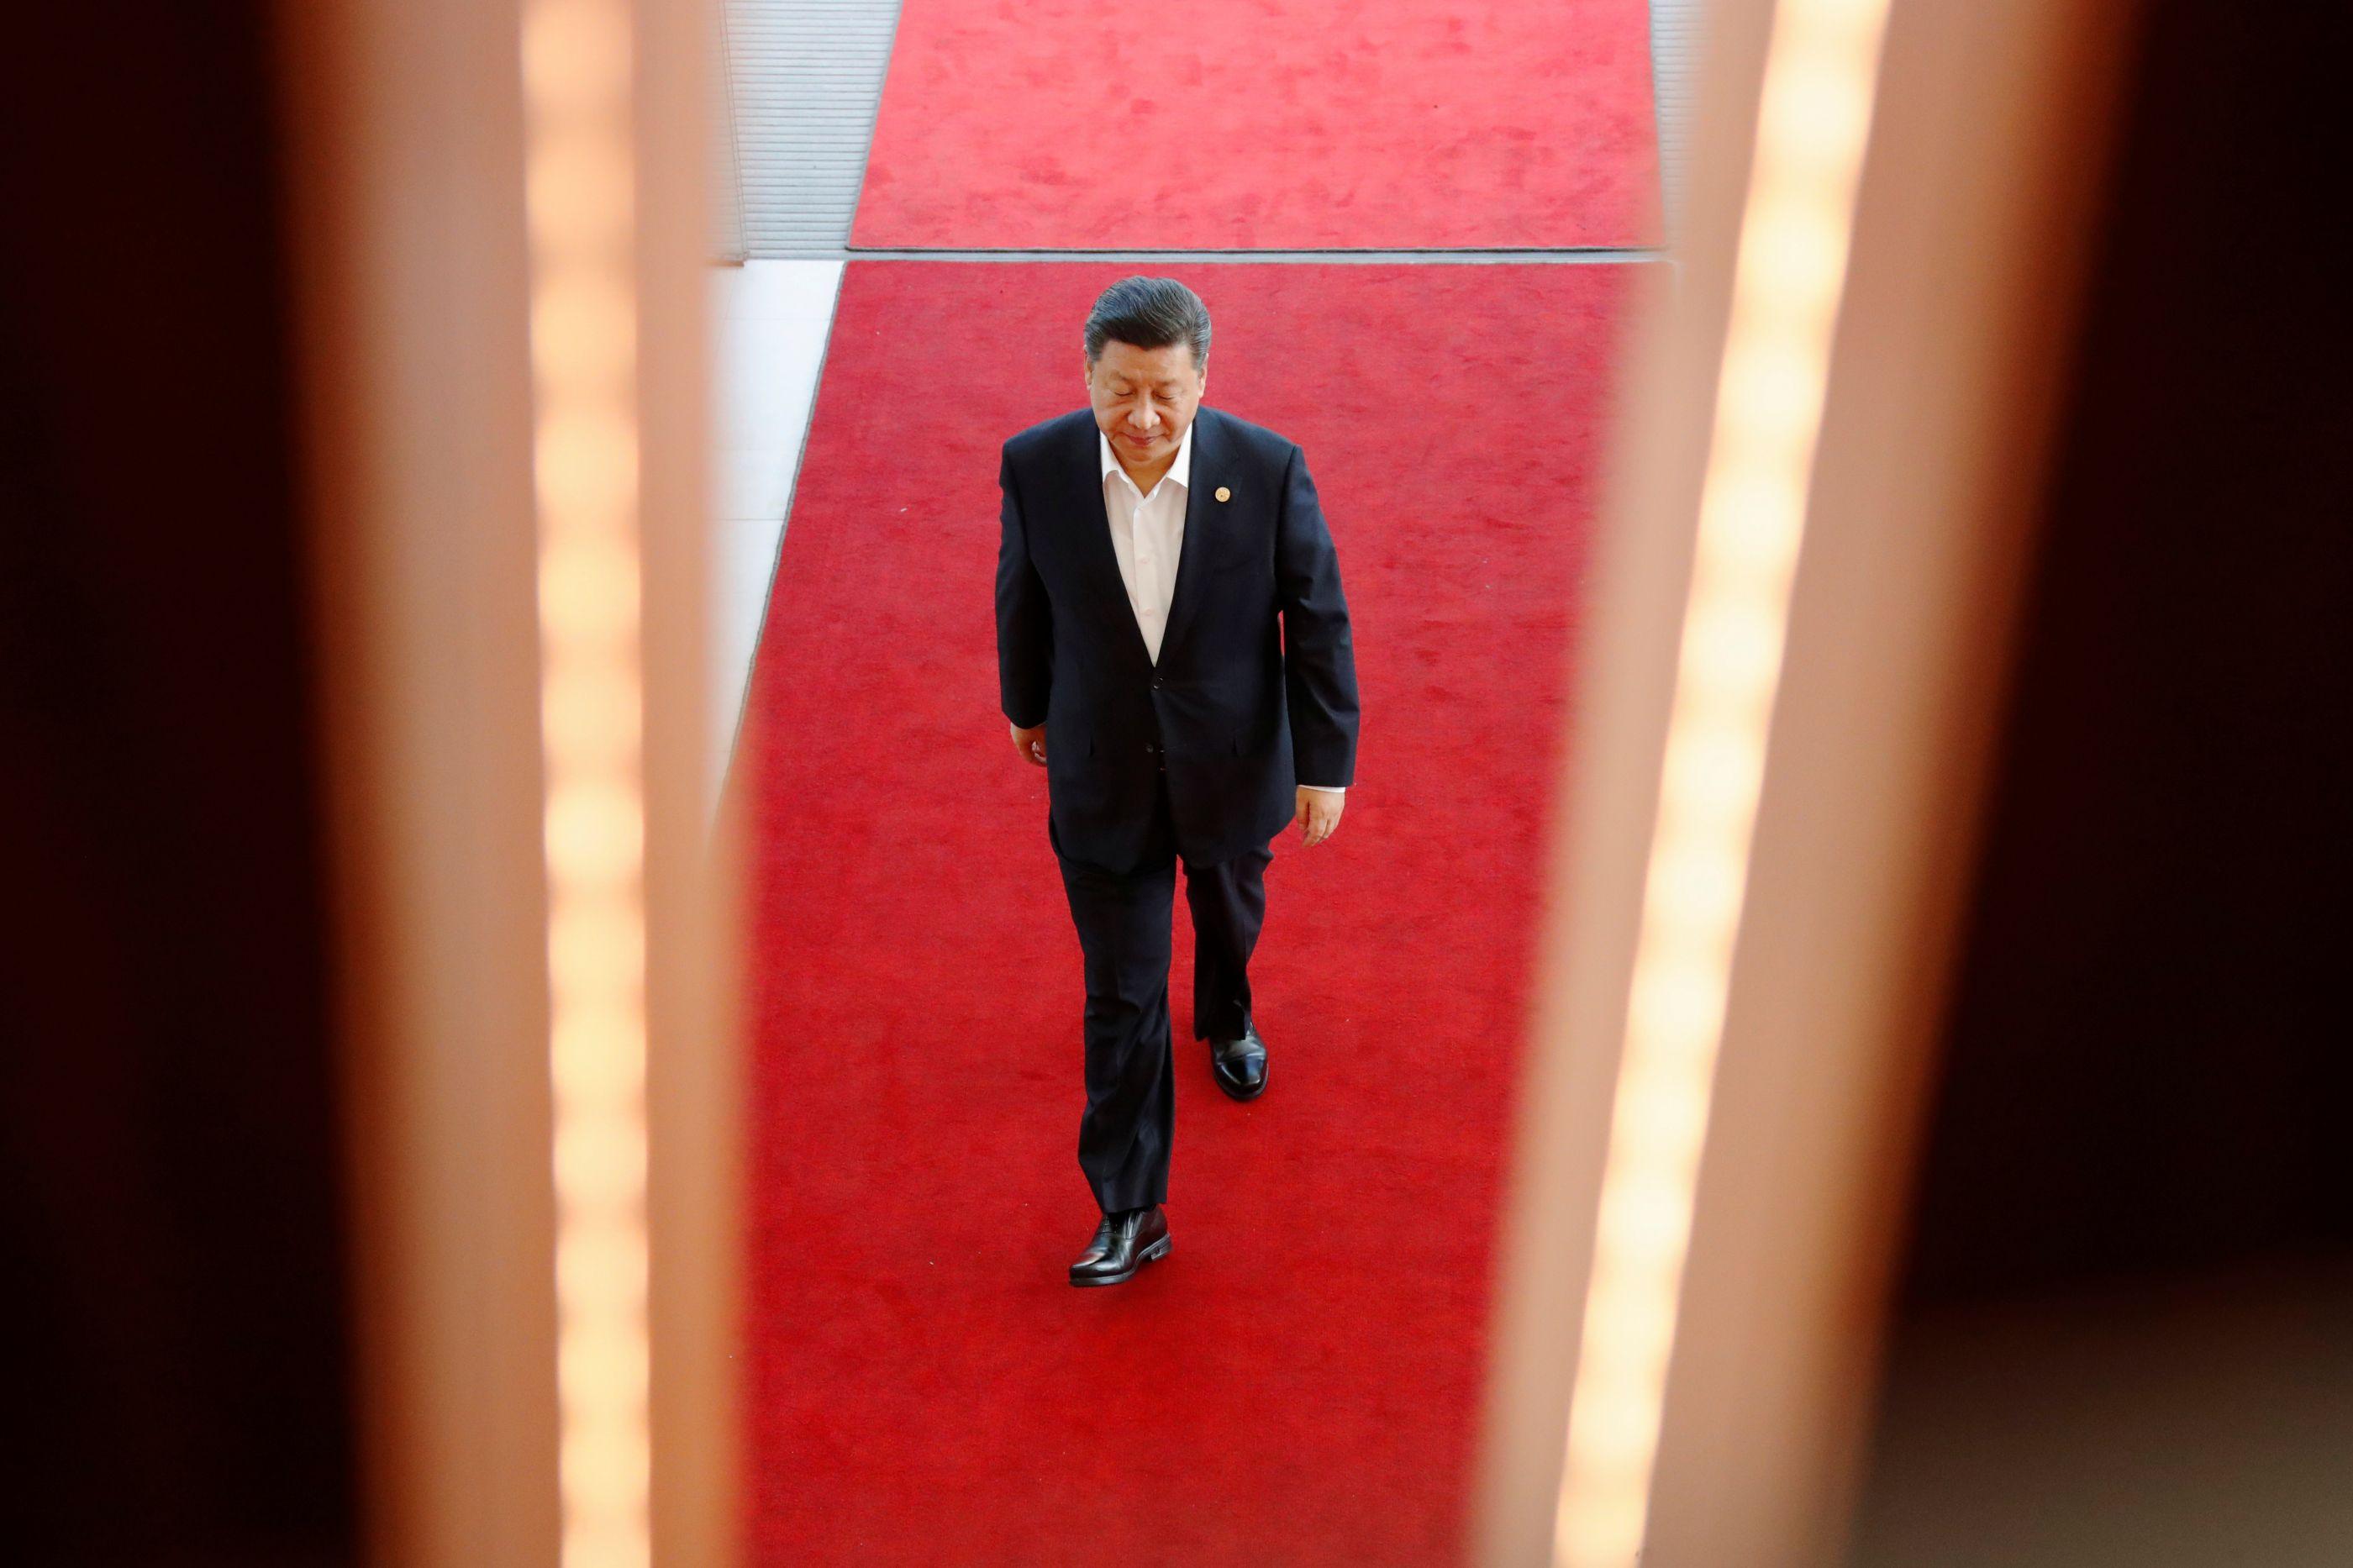 Das Filipinas chega queixa no Tribunal de Haia contra Xi Jinping